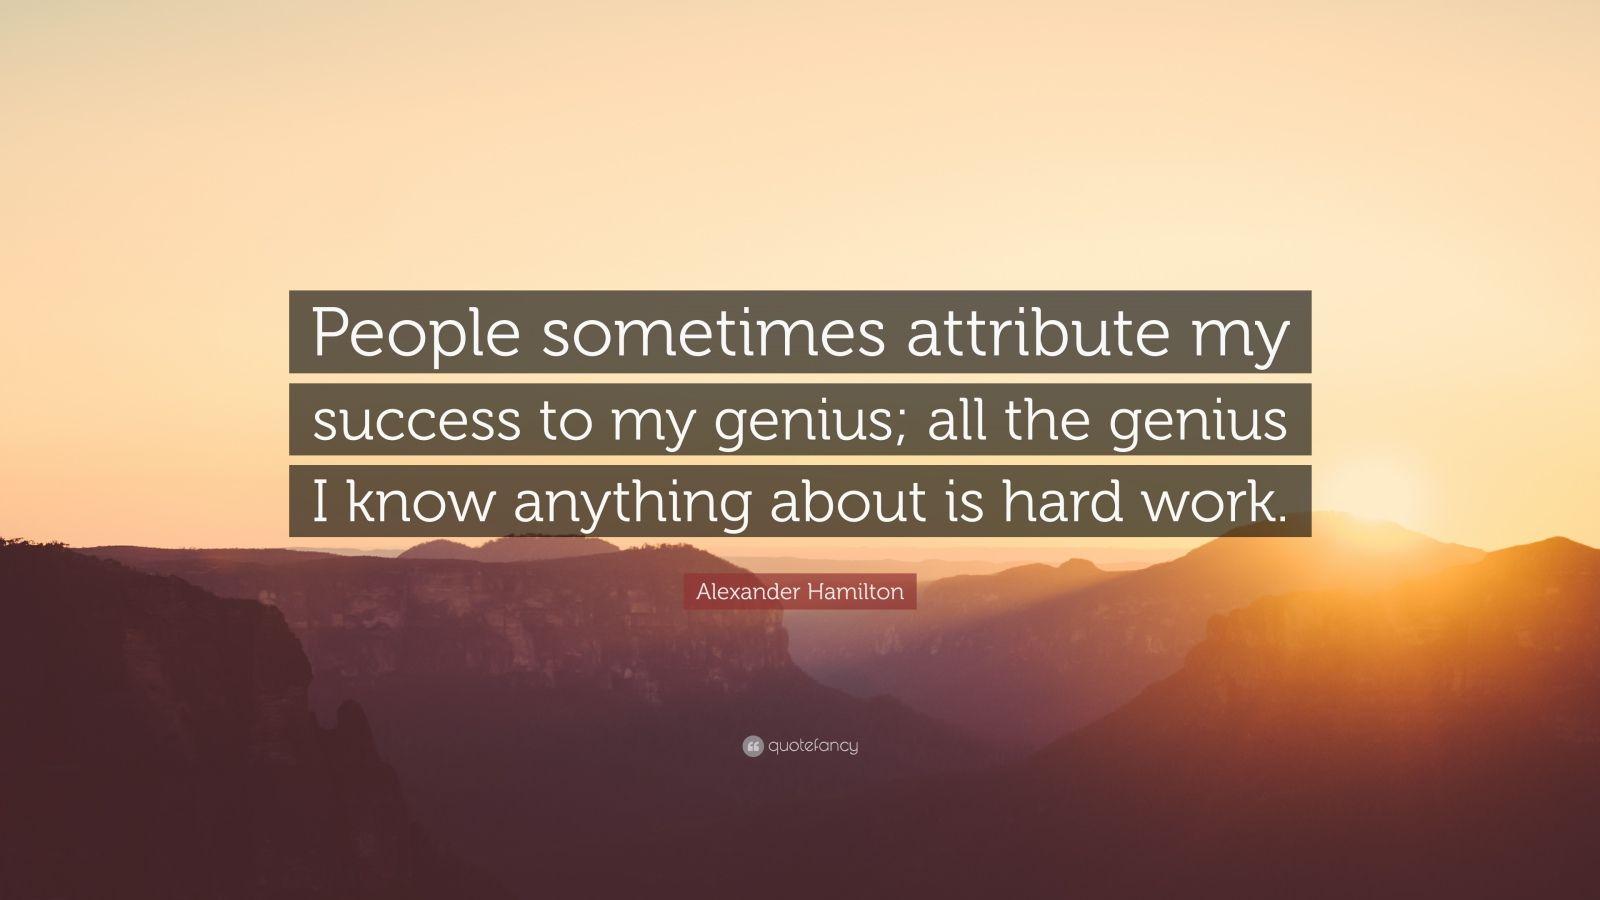 Success Quotes Desktop Wallpaper Alexander Hamilton Quote People Sometimes Attribute My